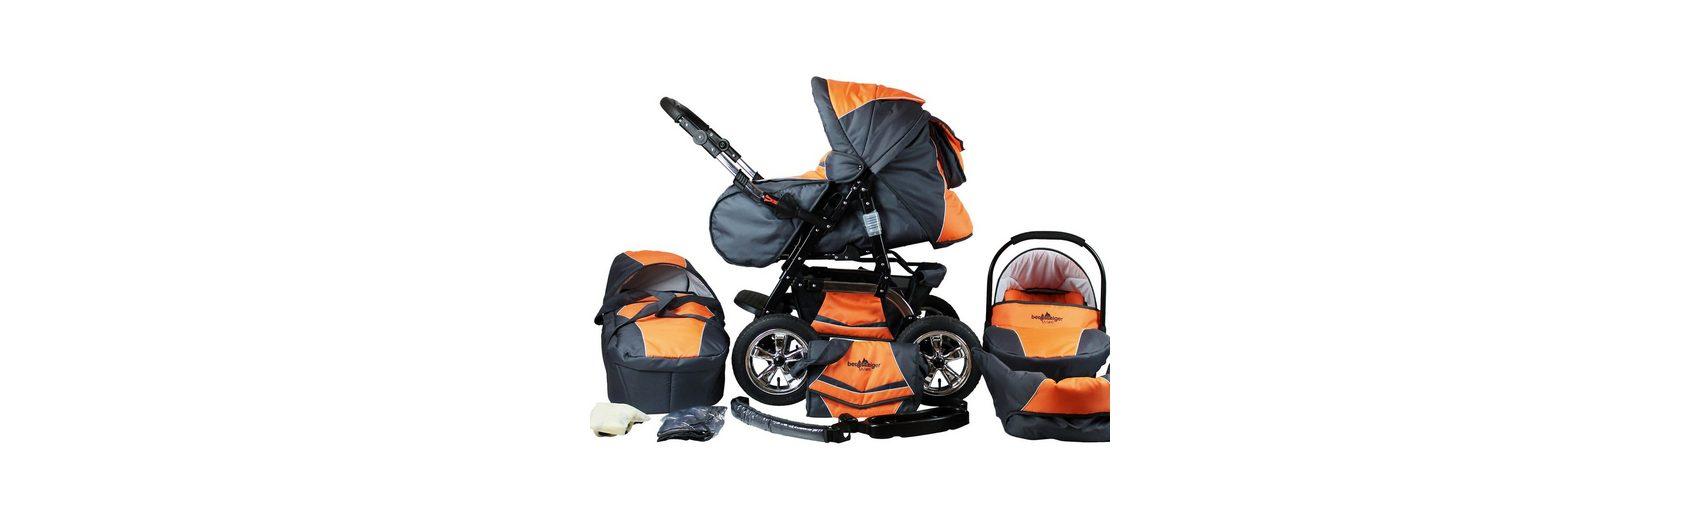 Bergsteiger Kombi Kinderwagen Milano, 10 tlg., orange & grey